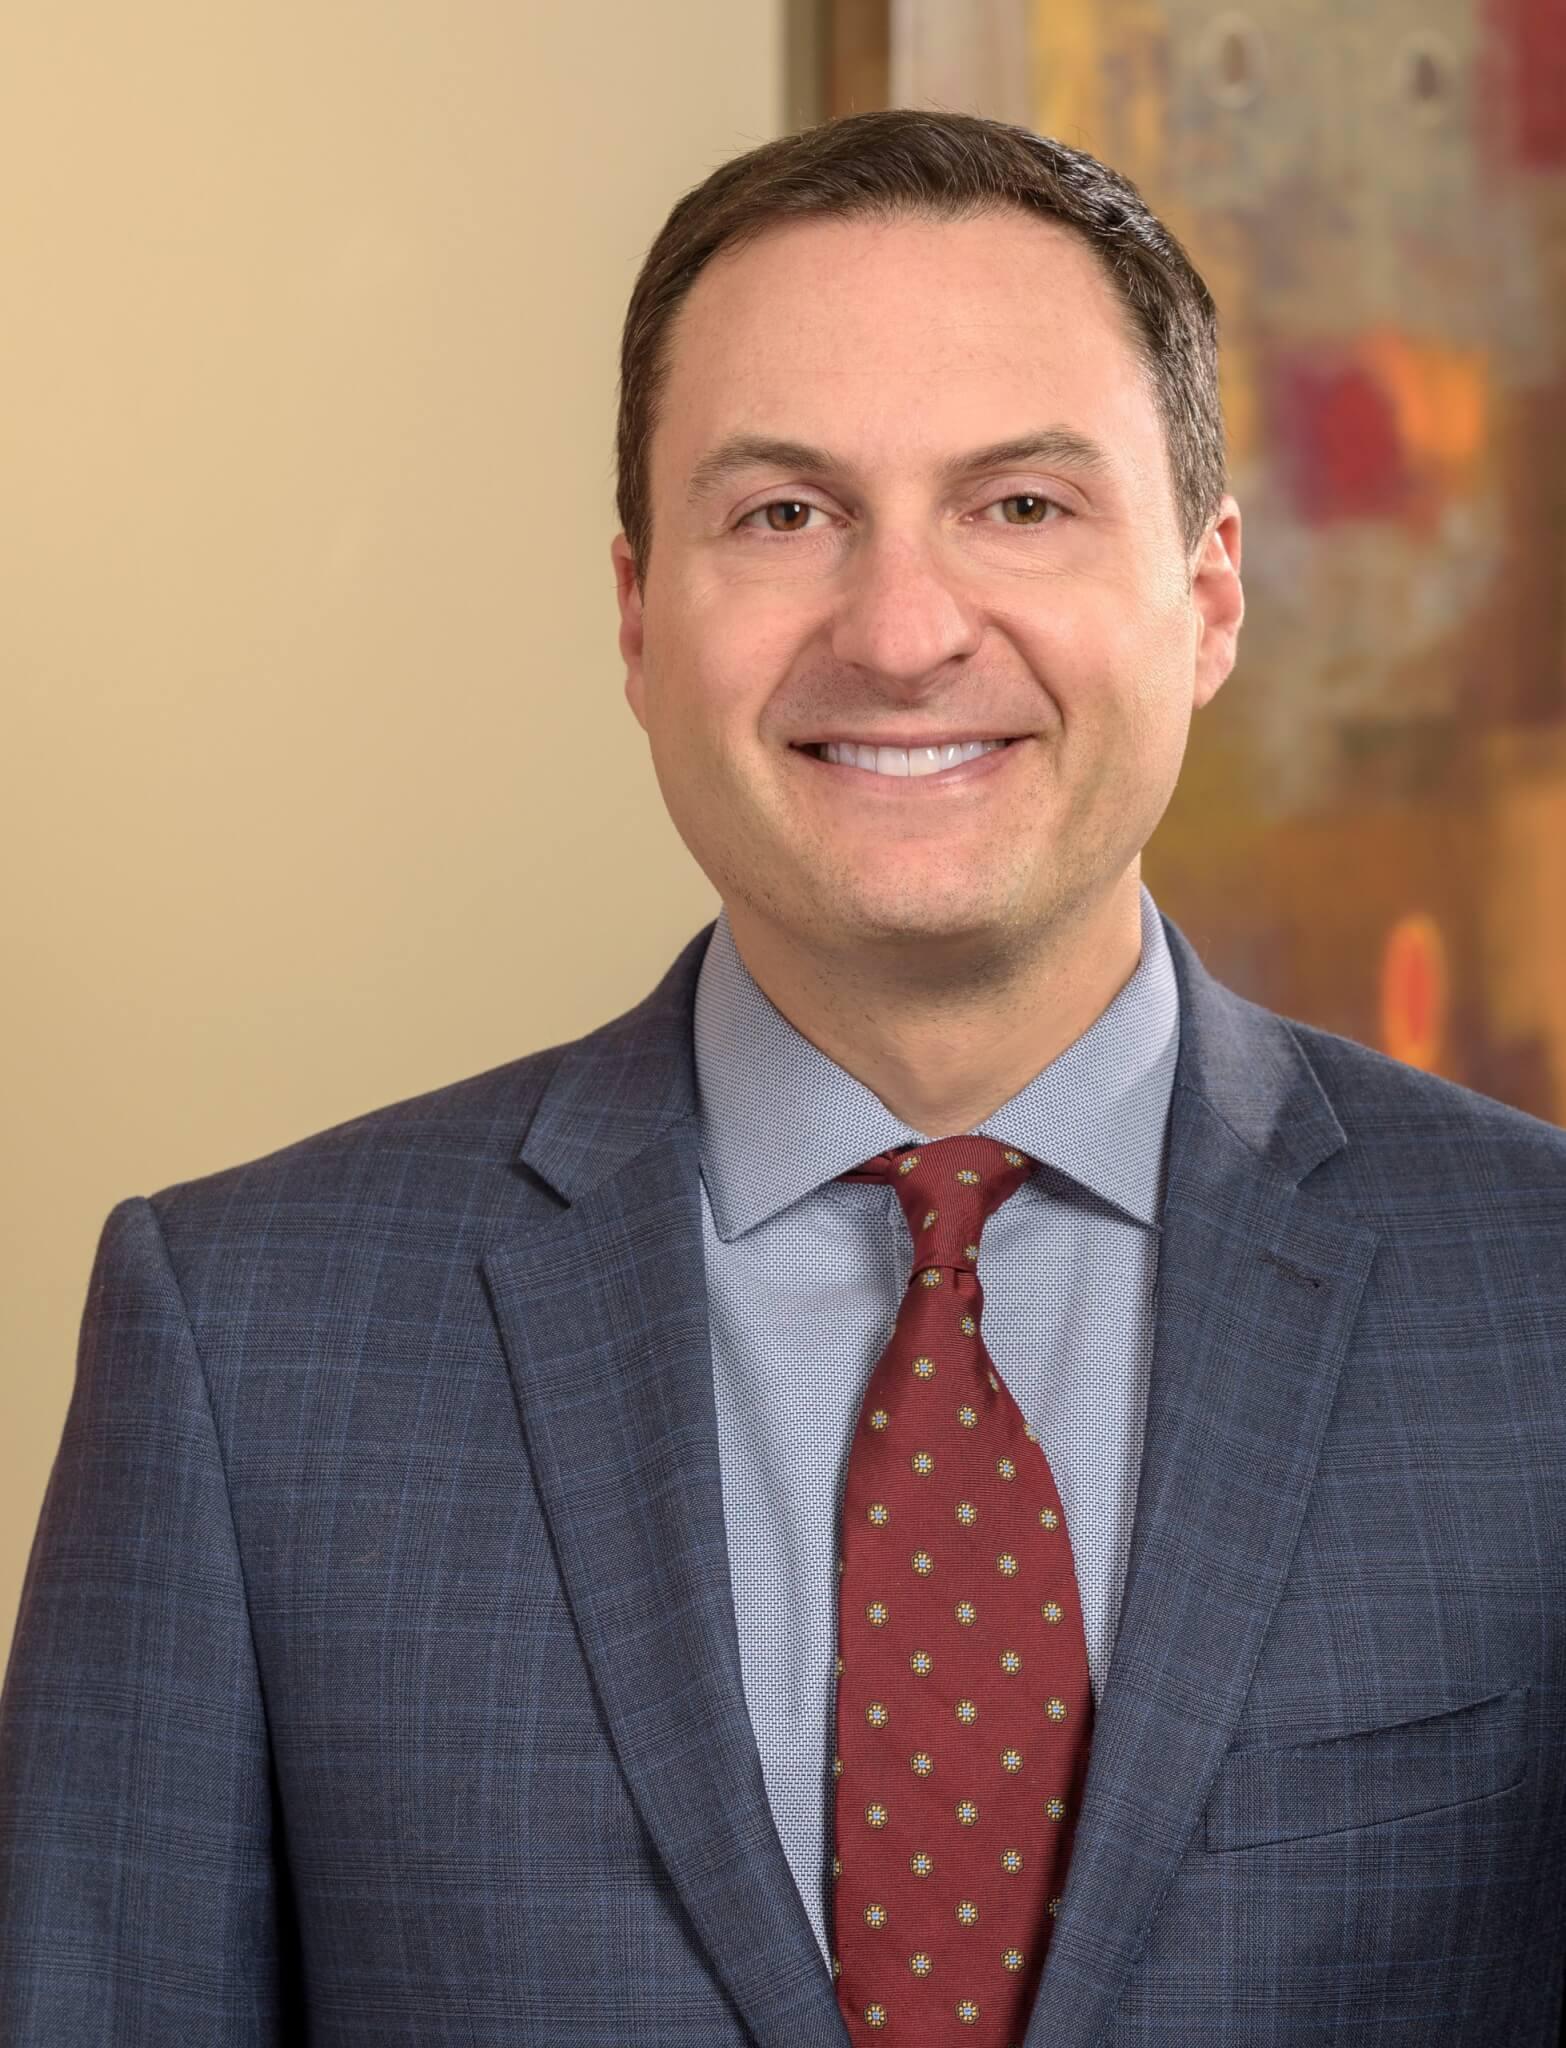 Dr. Patrick Wirtz